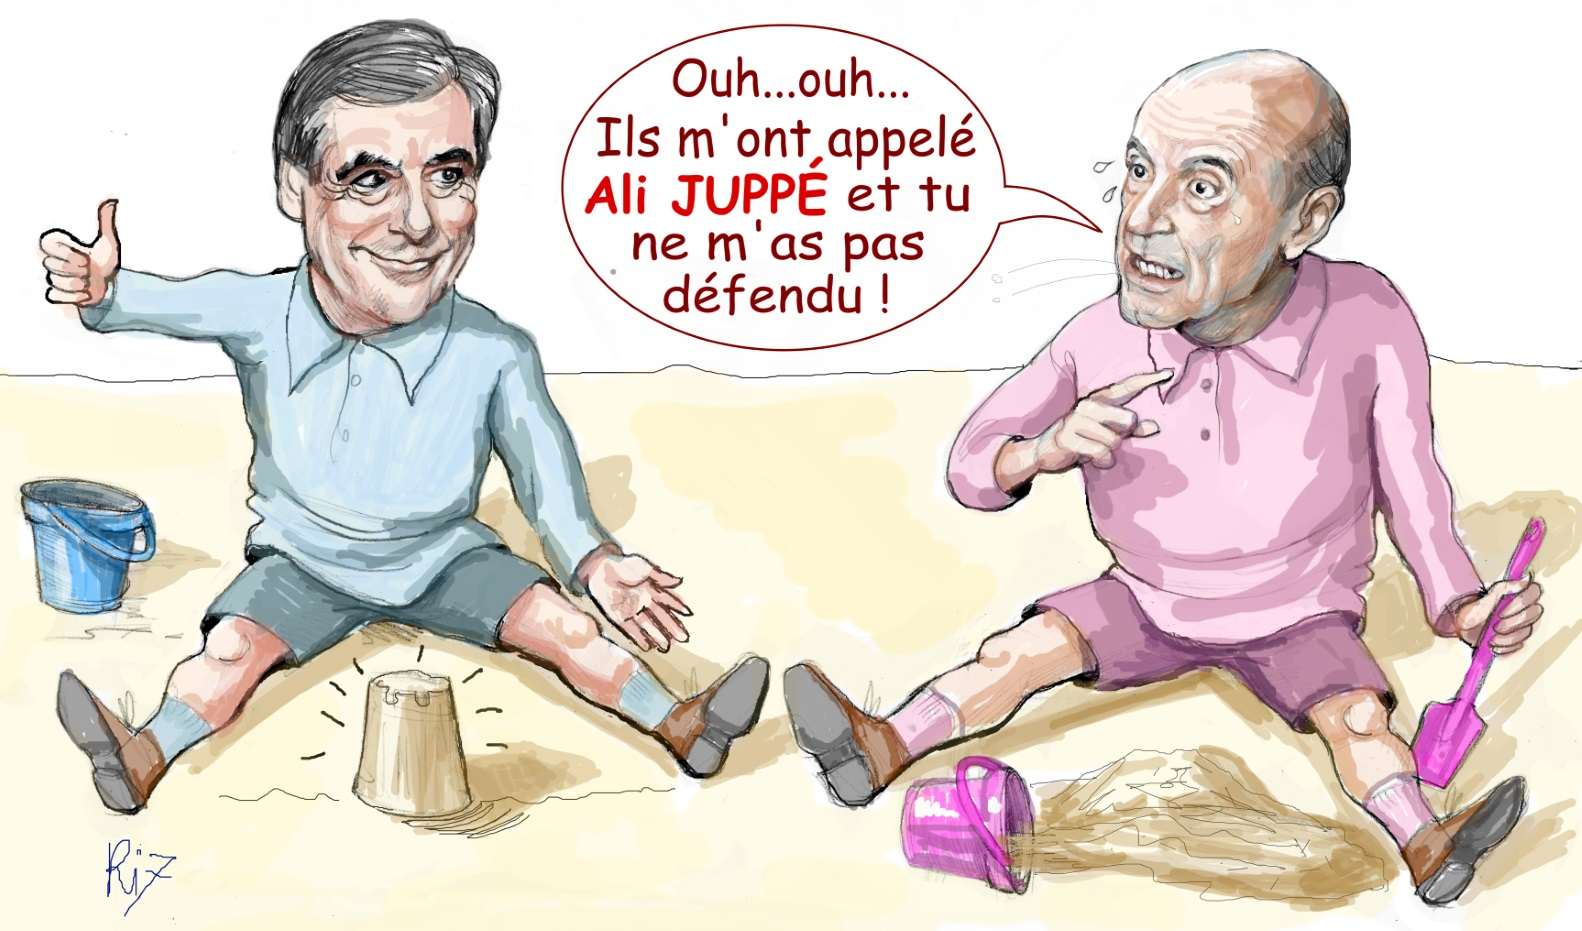 juppe-fillon-bac-a-sable-jpeg